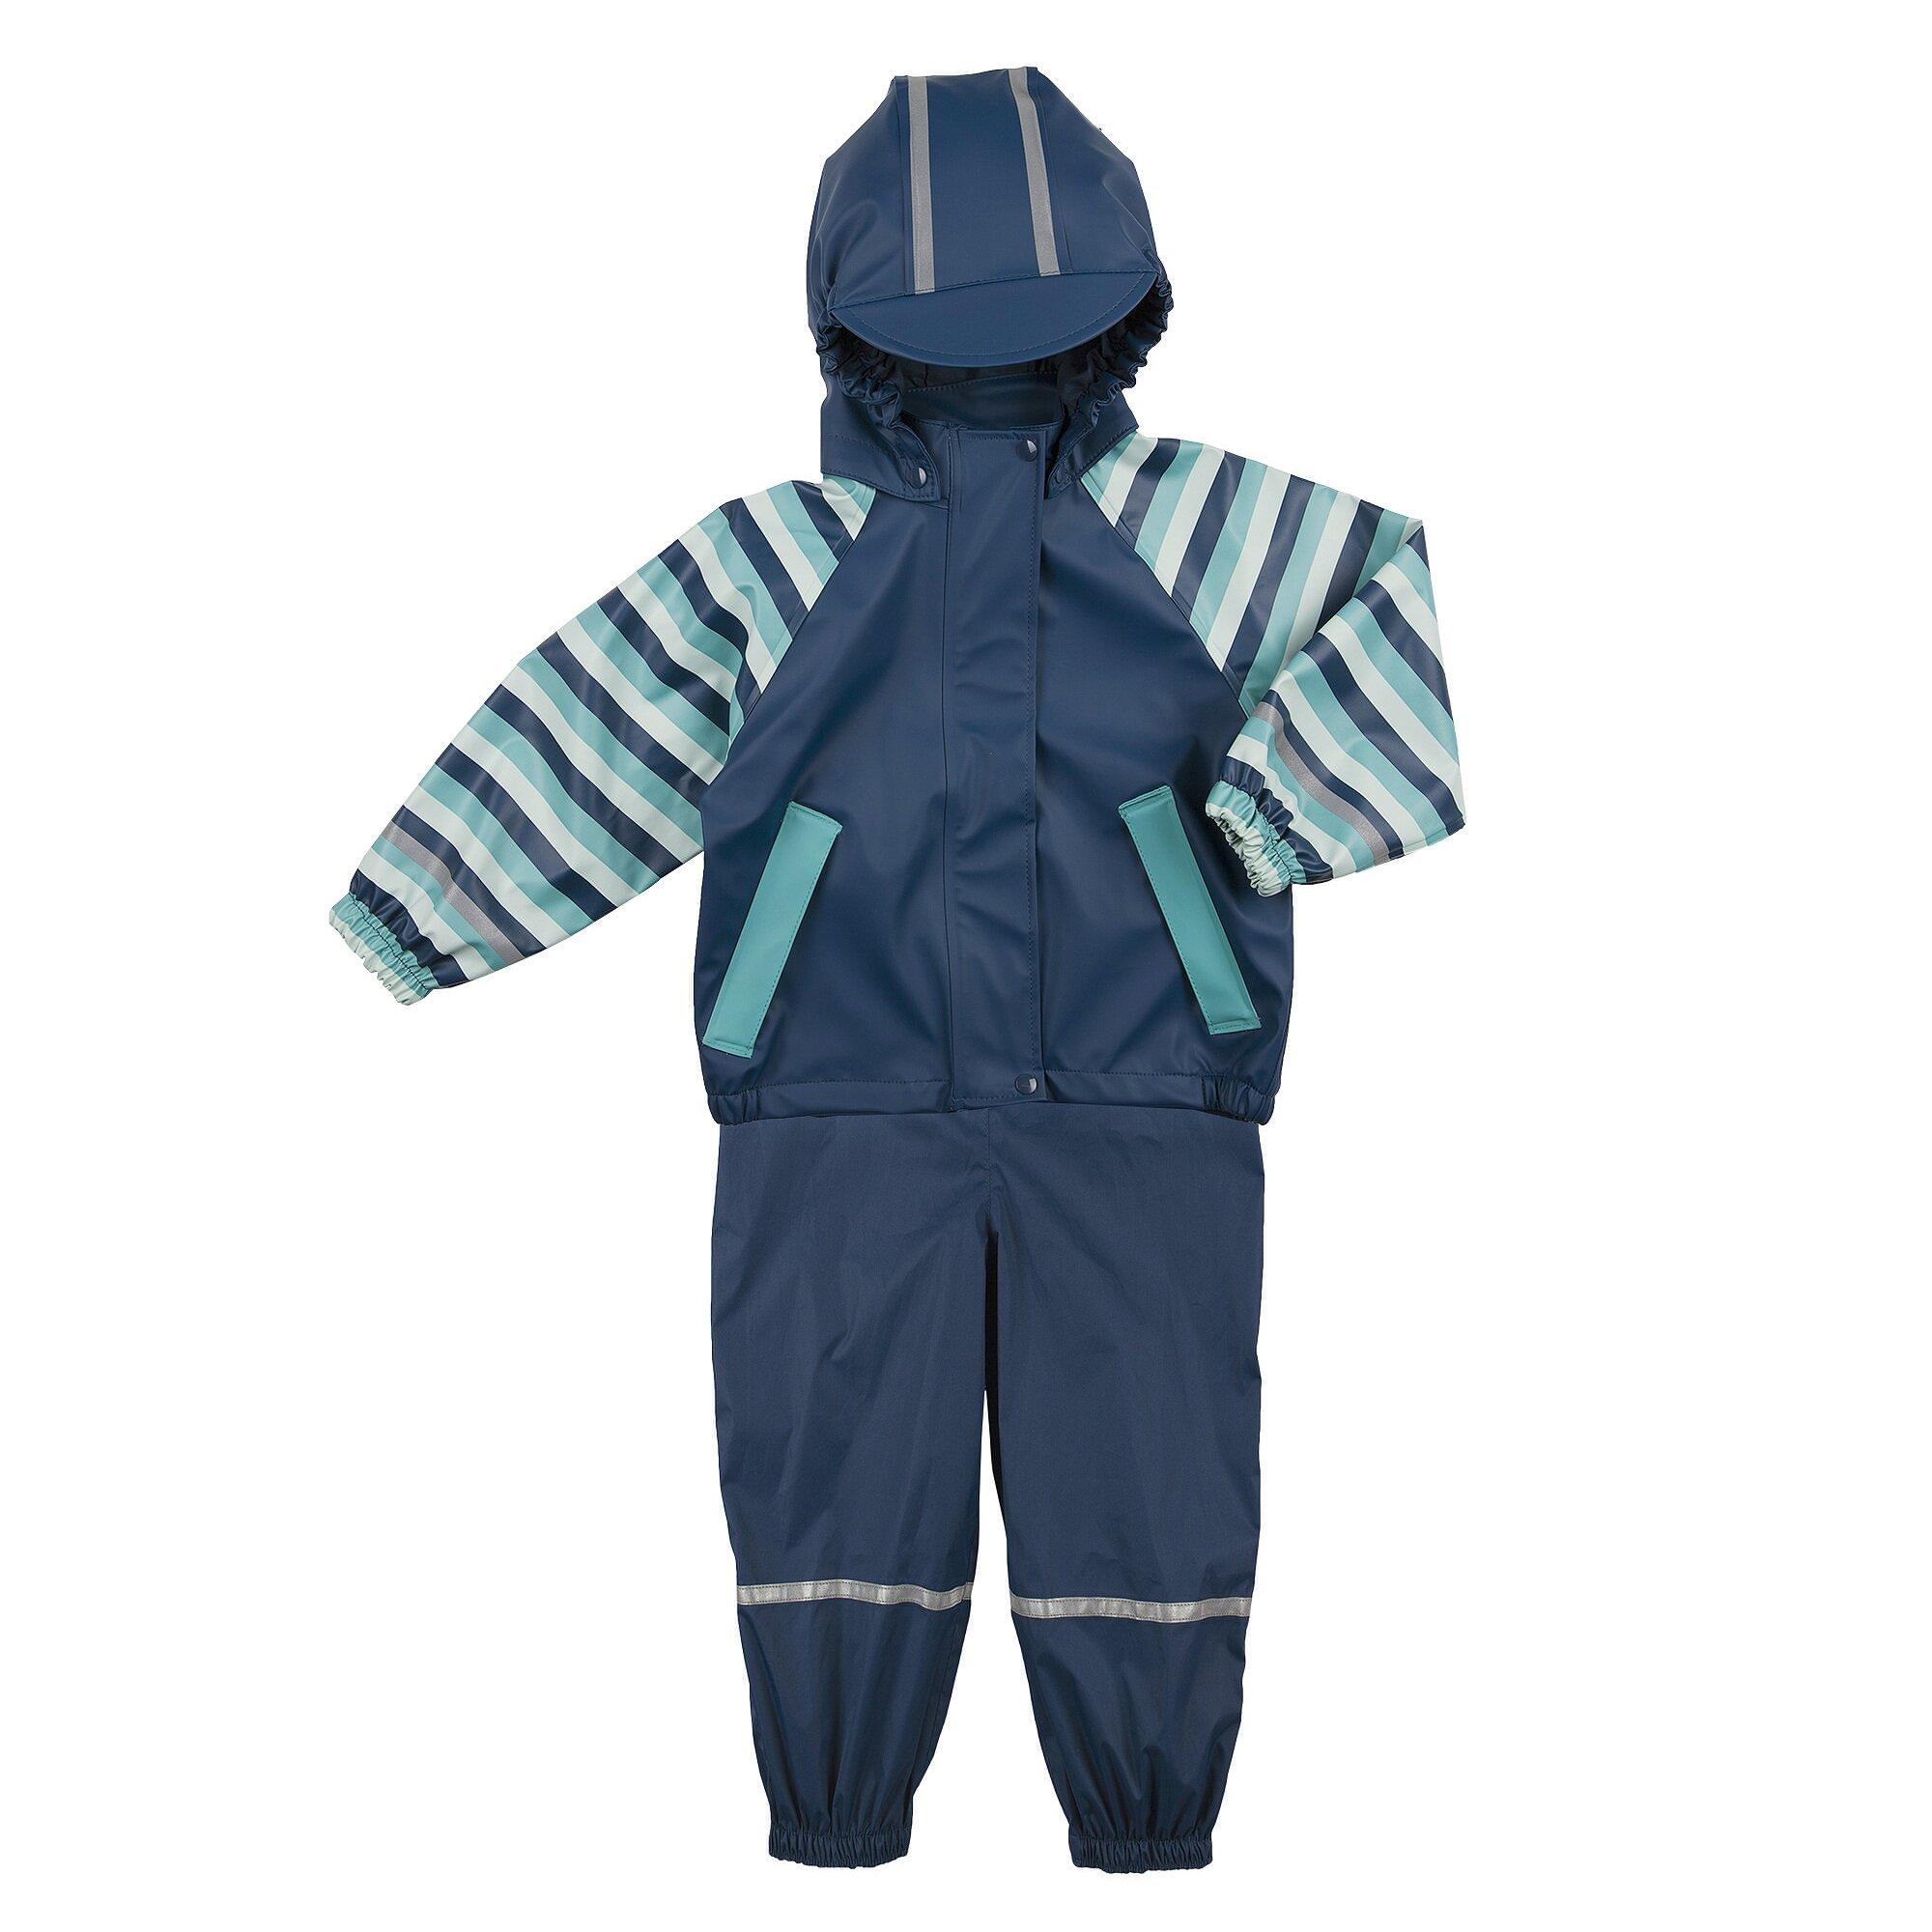 basics-regenanzug-blau-74-86-98